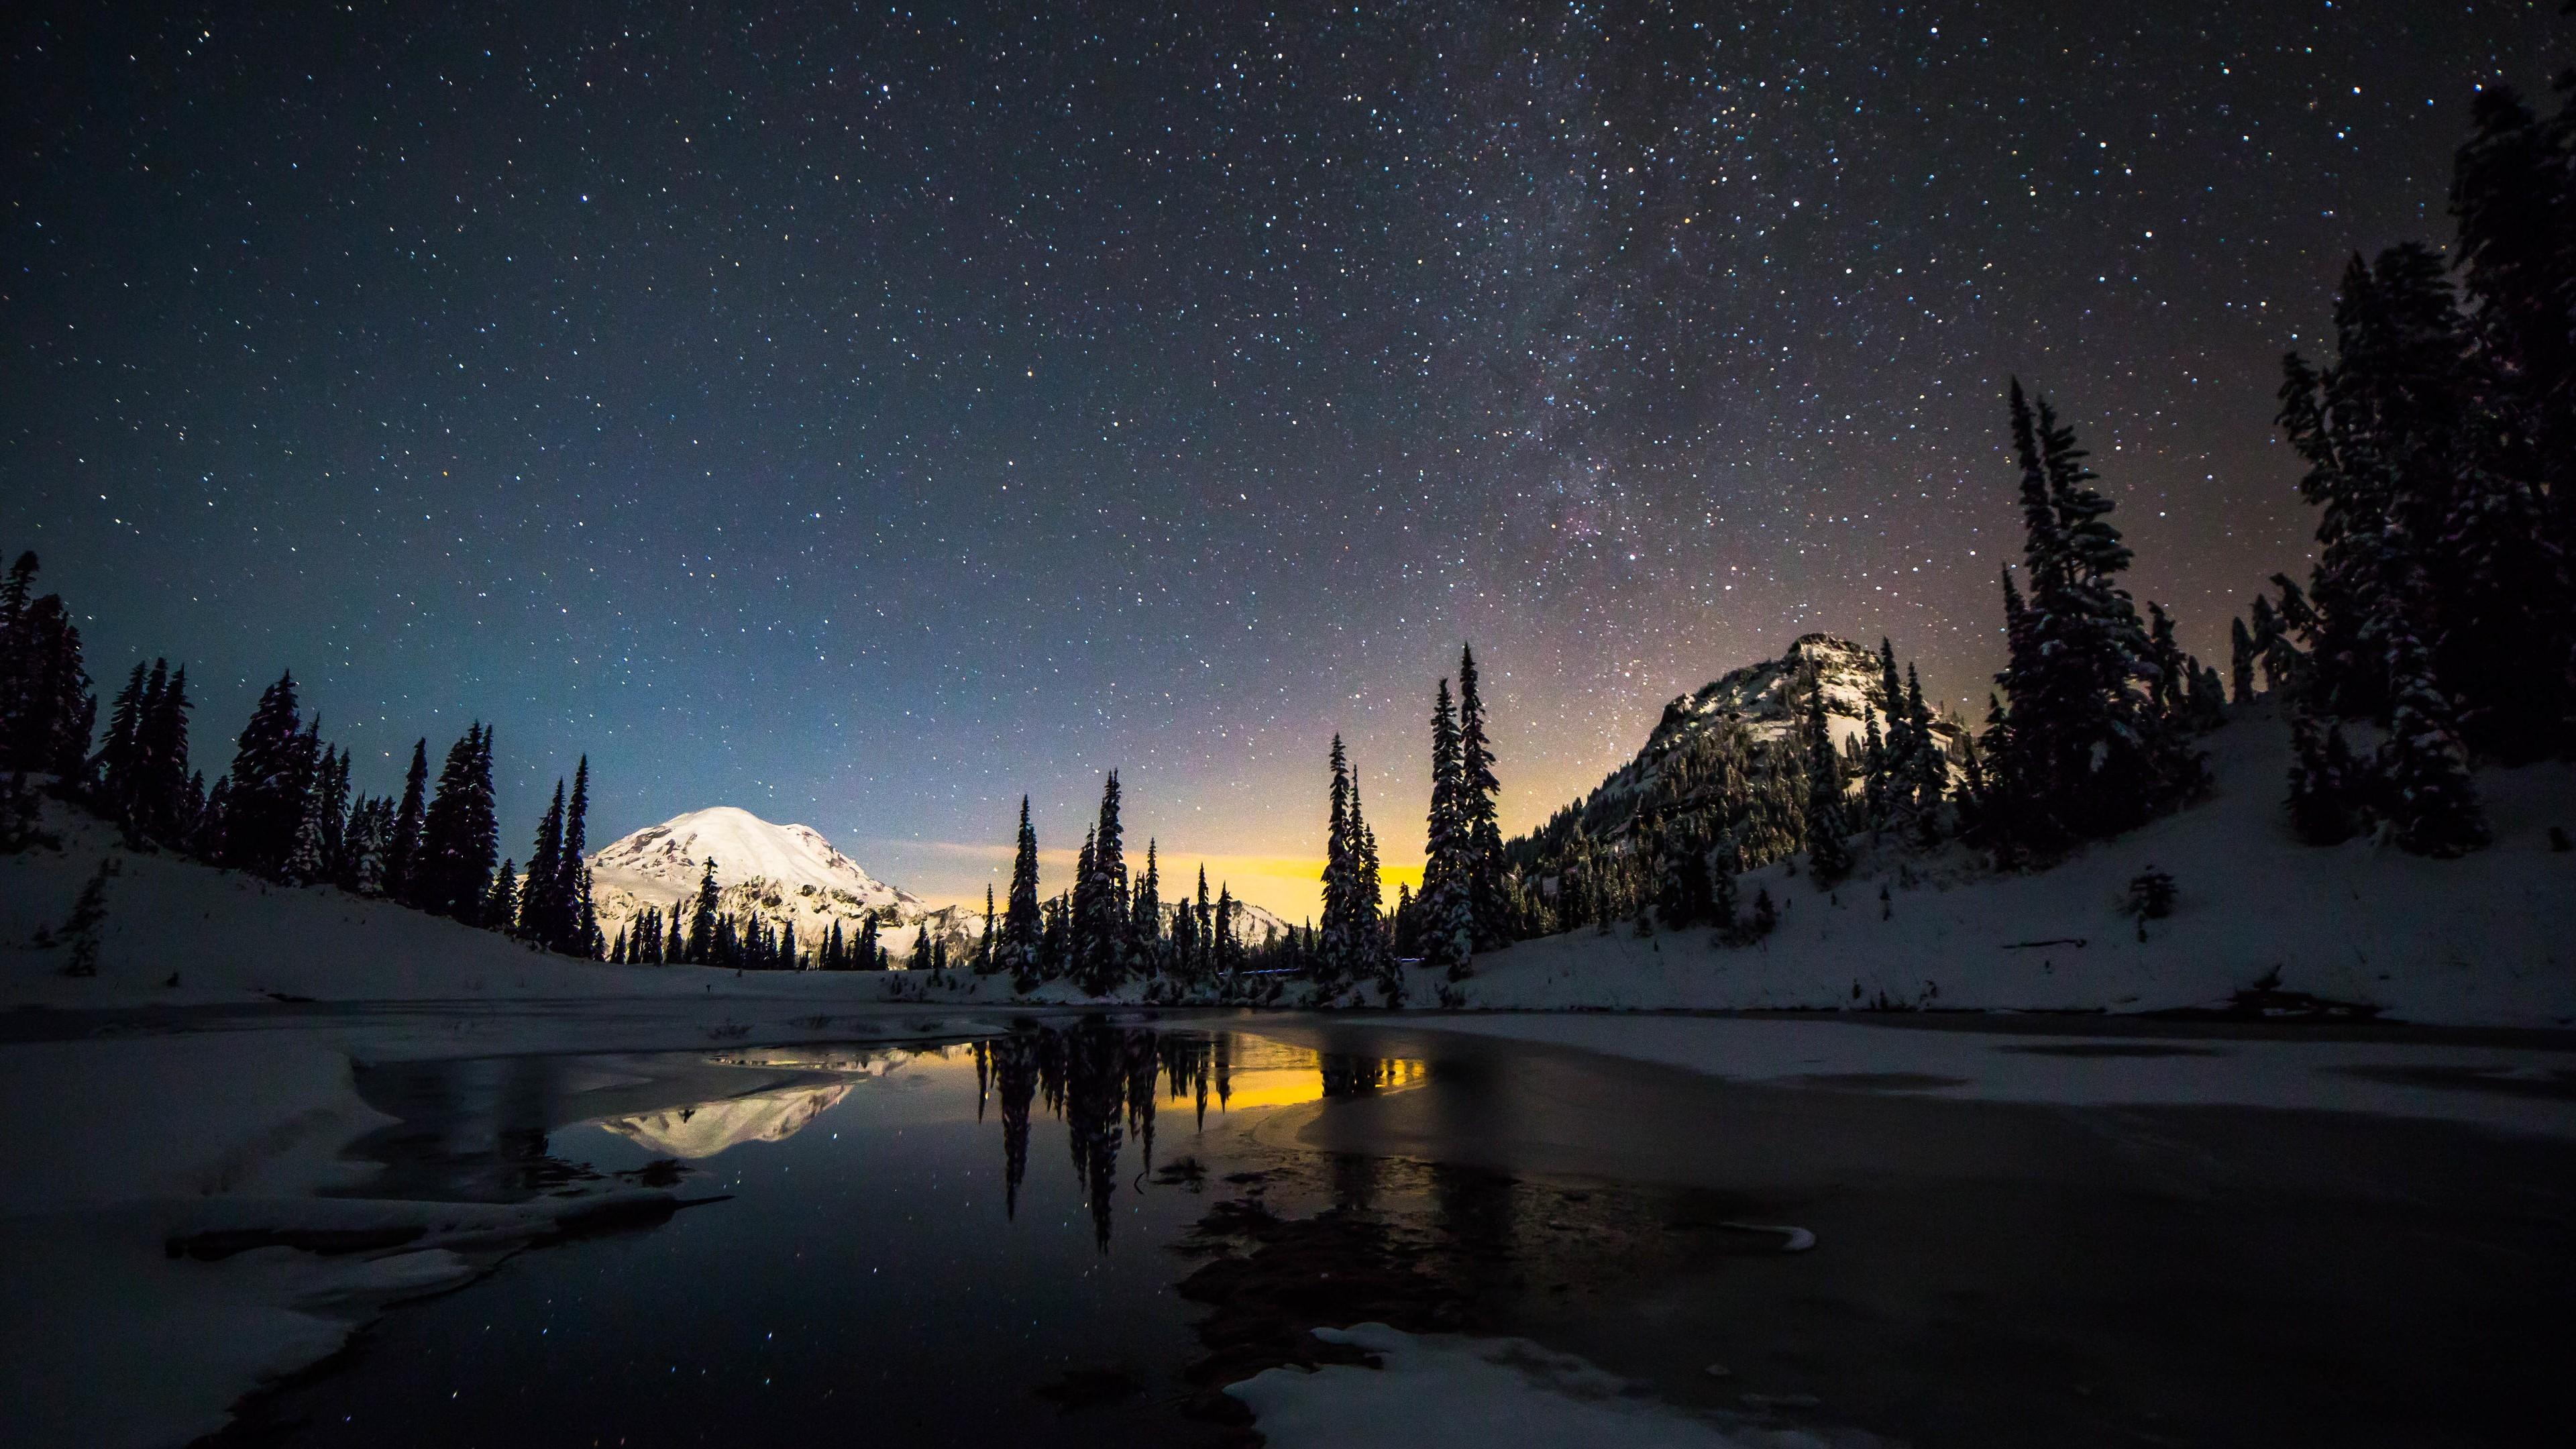 space wallpaper 4k,sky,nature,snow,winter,night